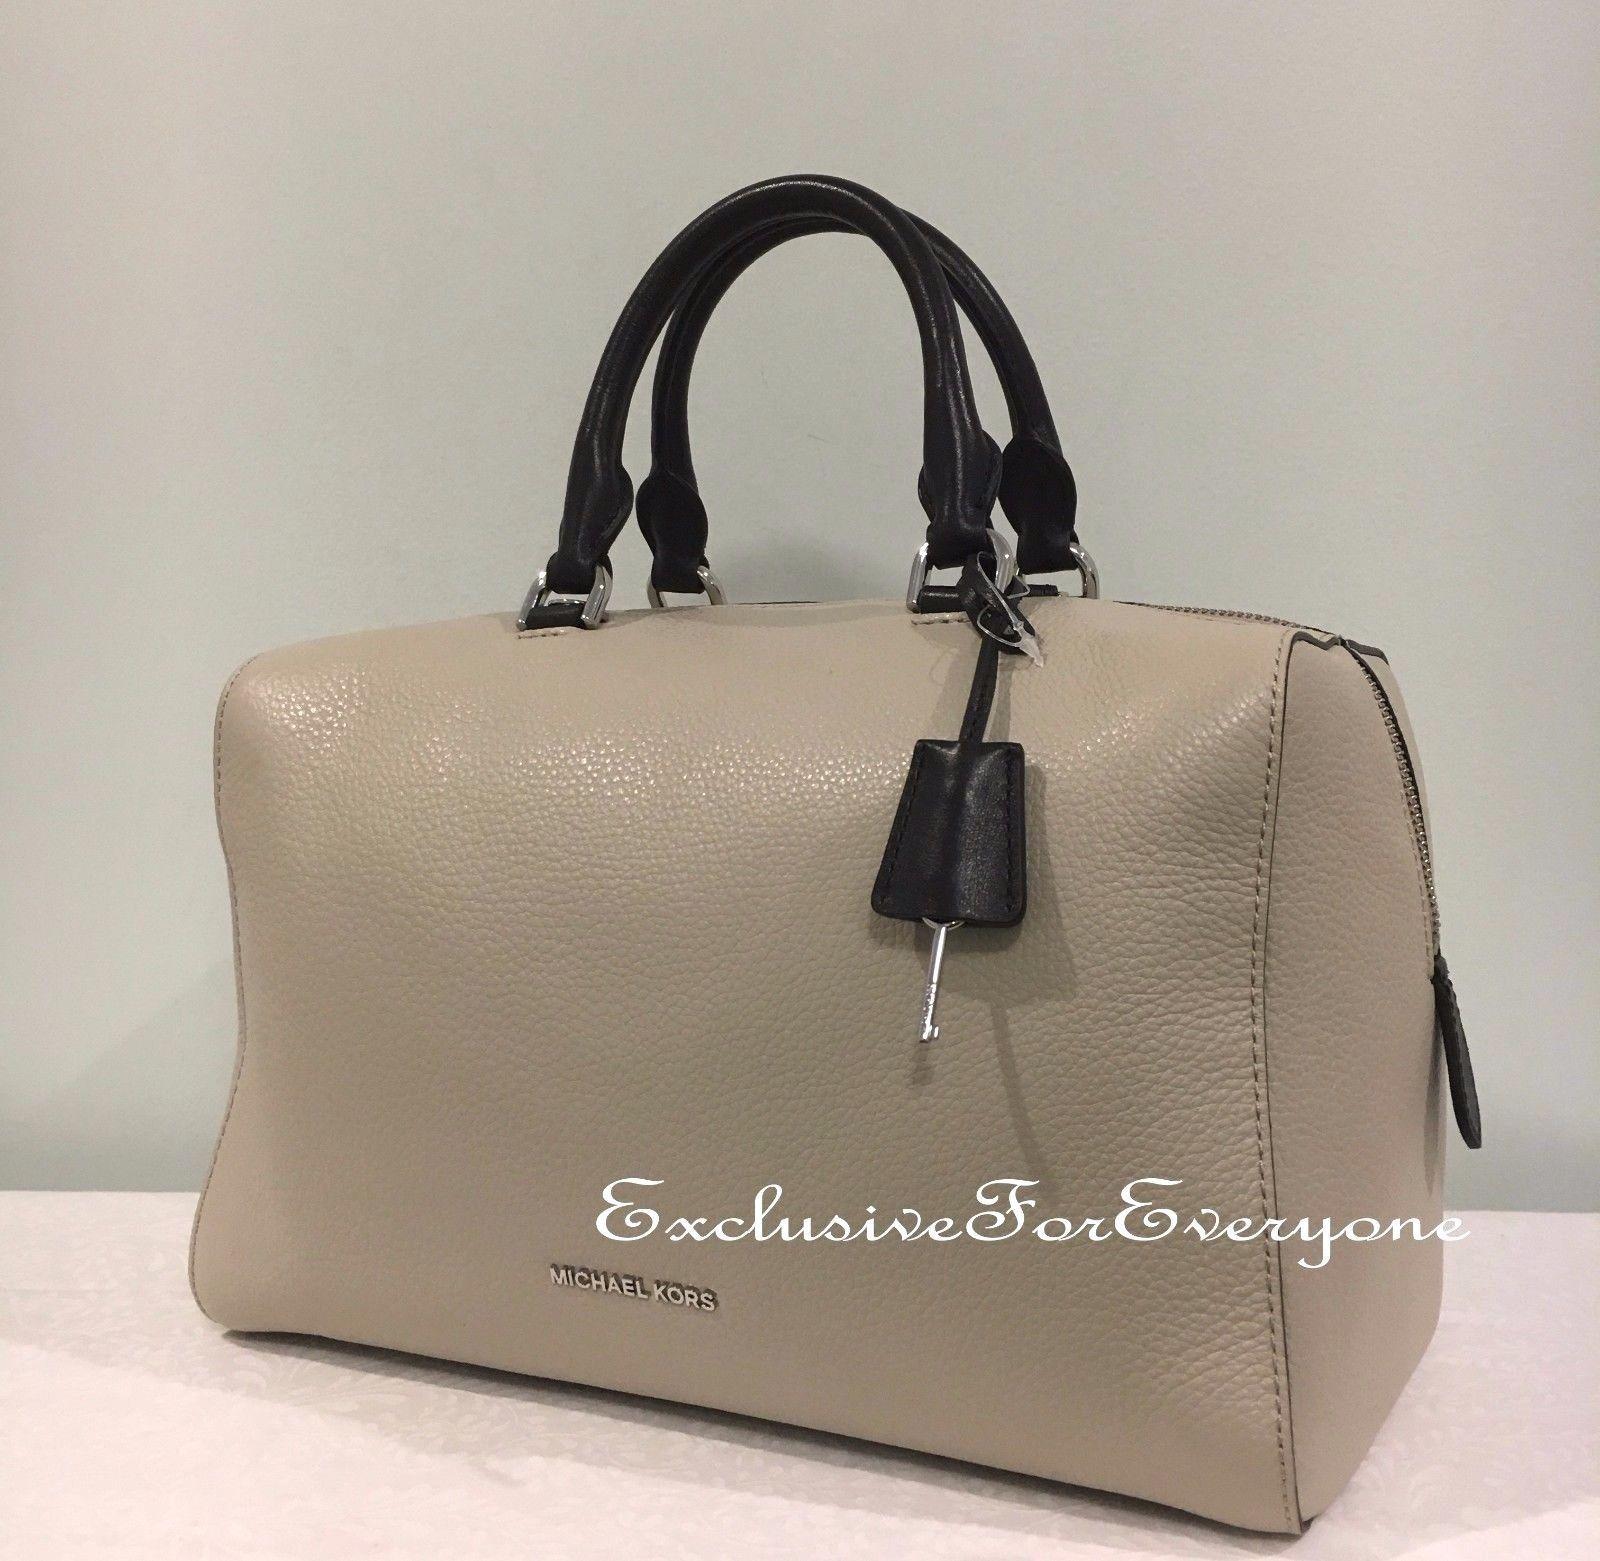 c326b51f5925 NWT Michael Kors Kirby Large Satchel Cement Black Leather Handbag  348   179.99